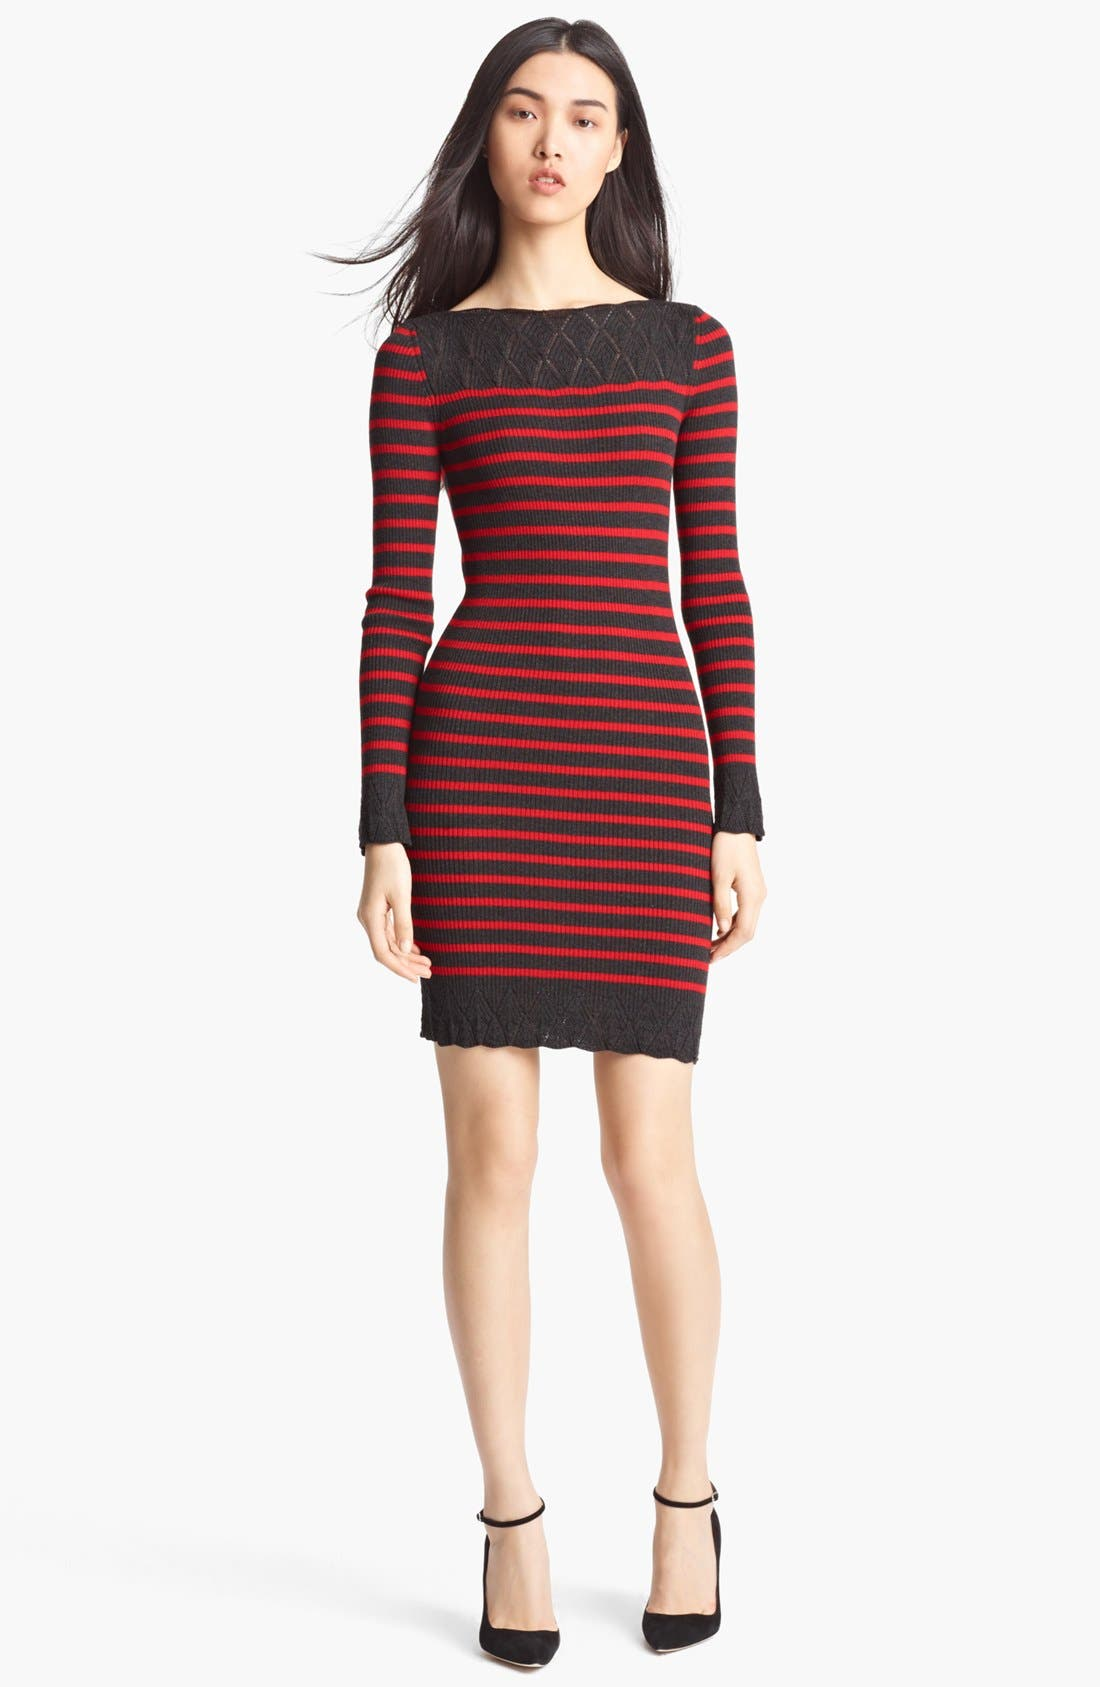 Alternate Image 1 Selected - Jean Paul Gaultier Fuzzi Nautical Stripe Knit Dress